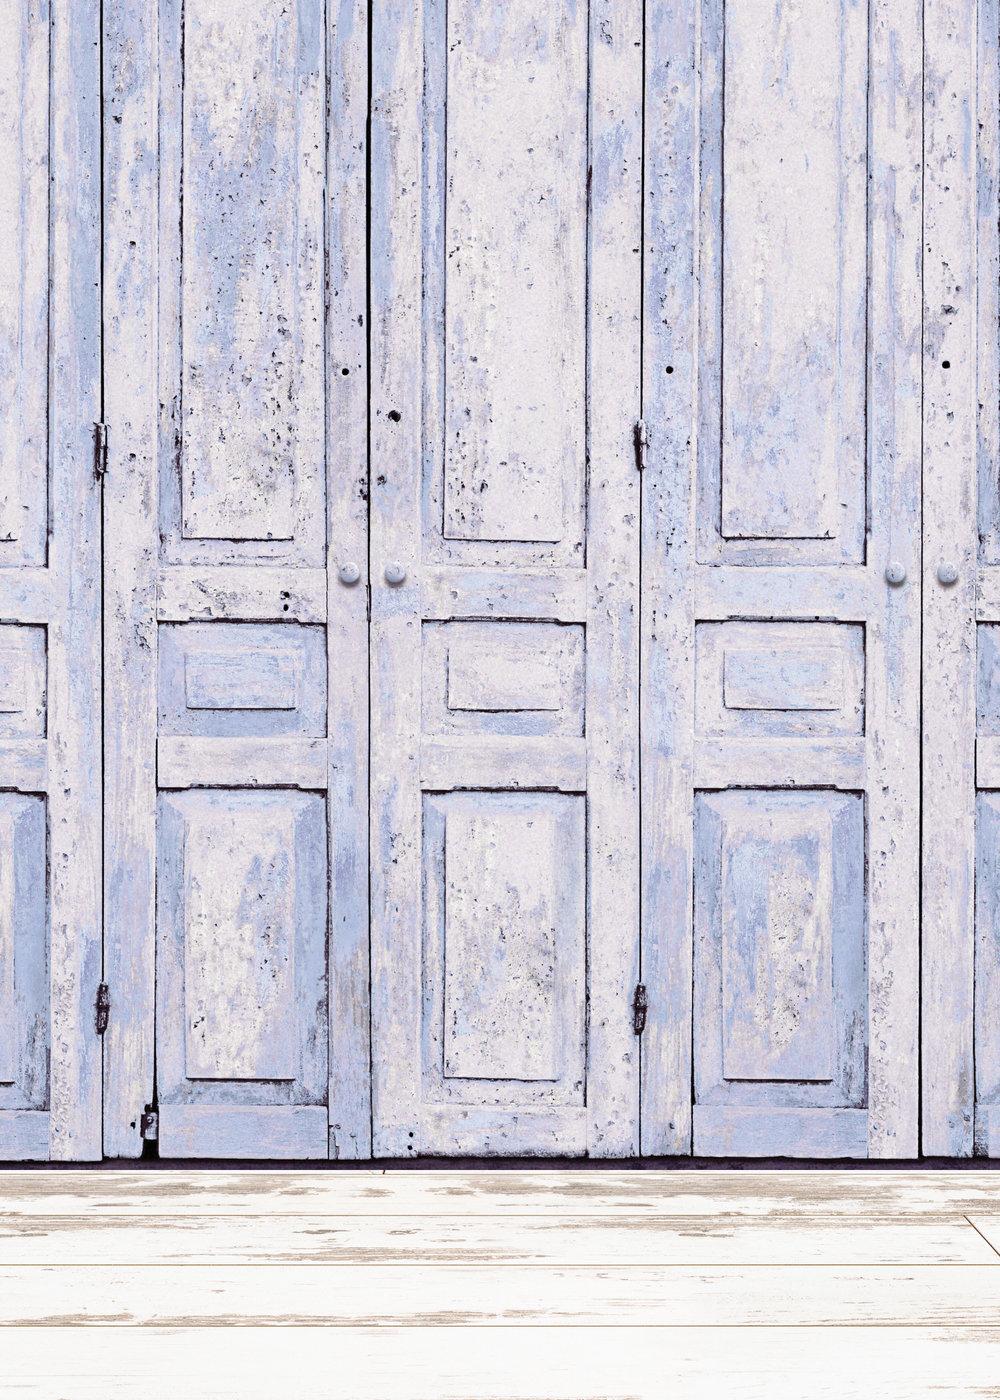 Background R - Blue Doors